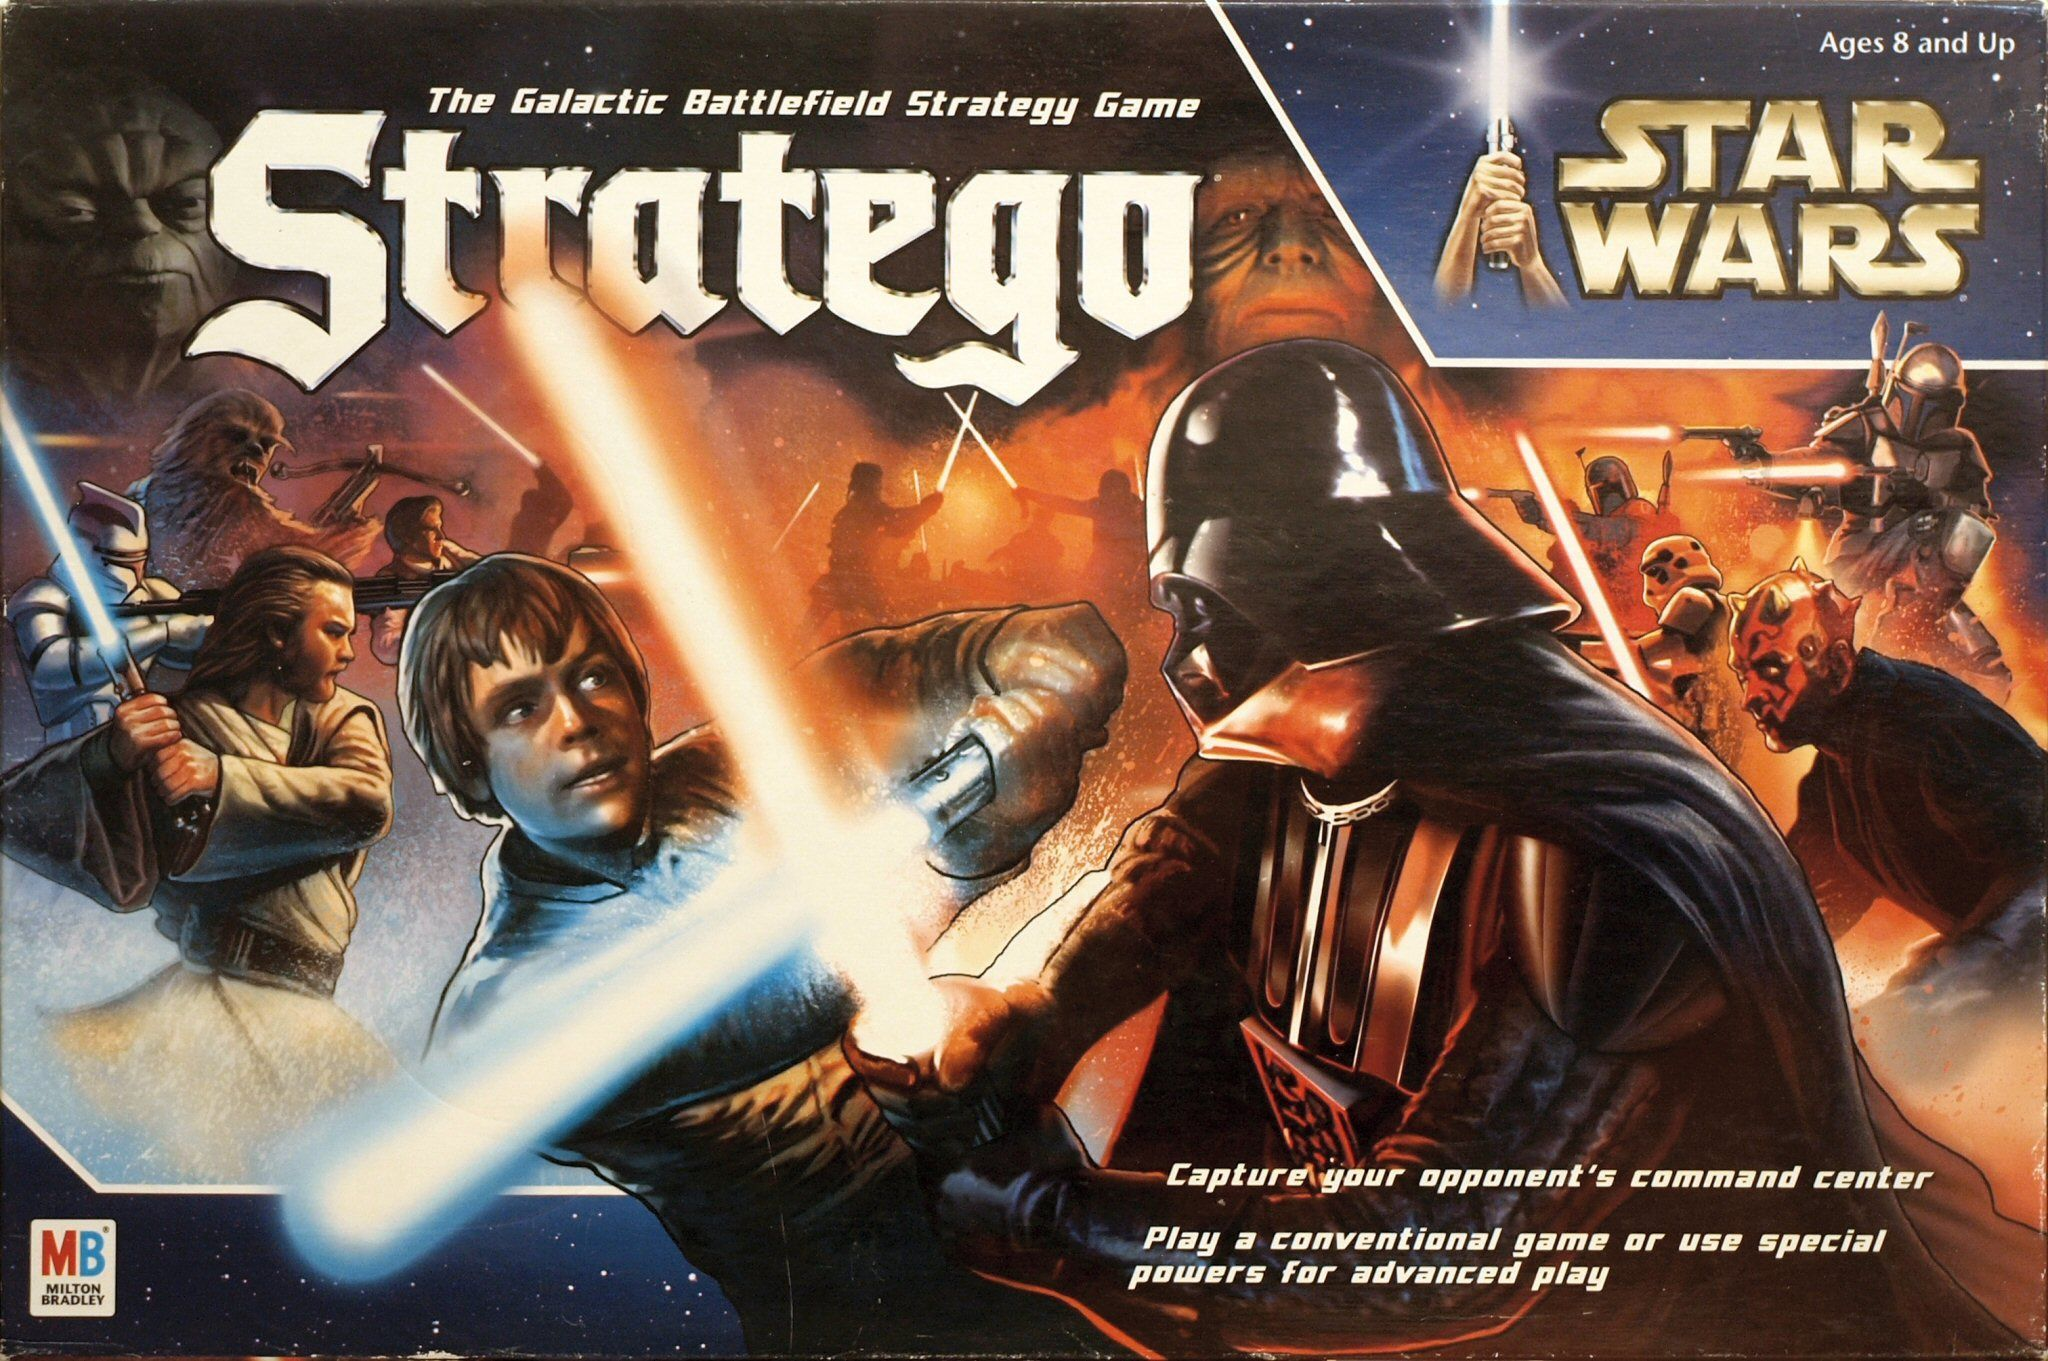 Stratego: Star Wars